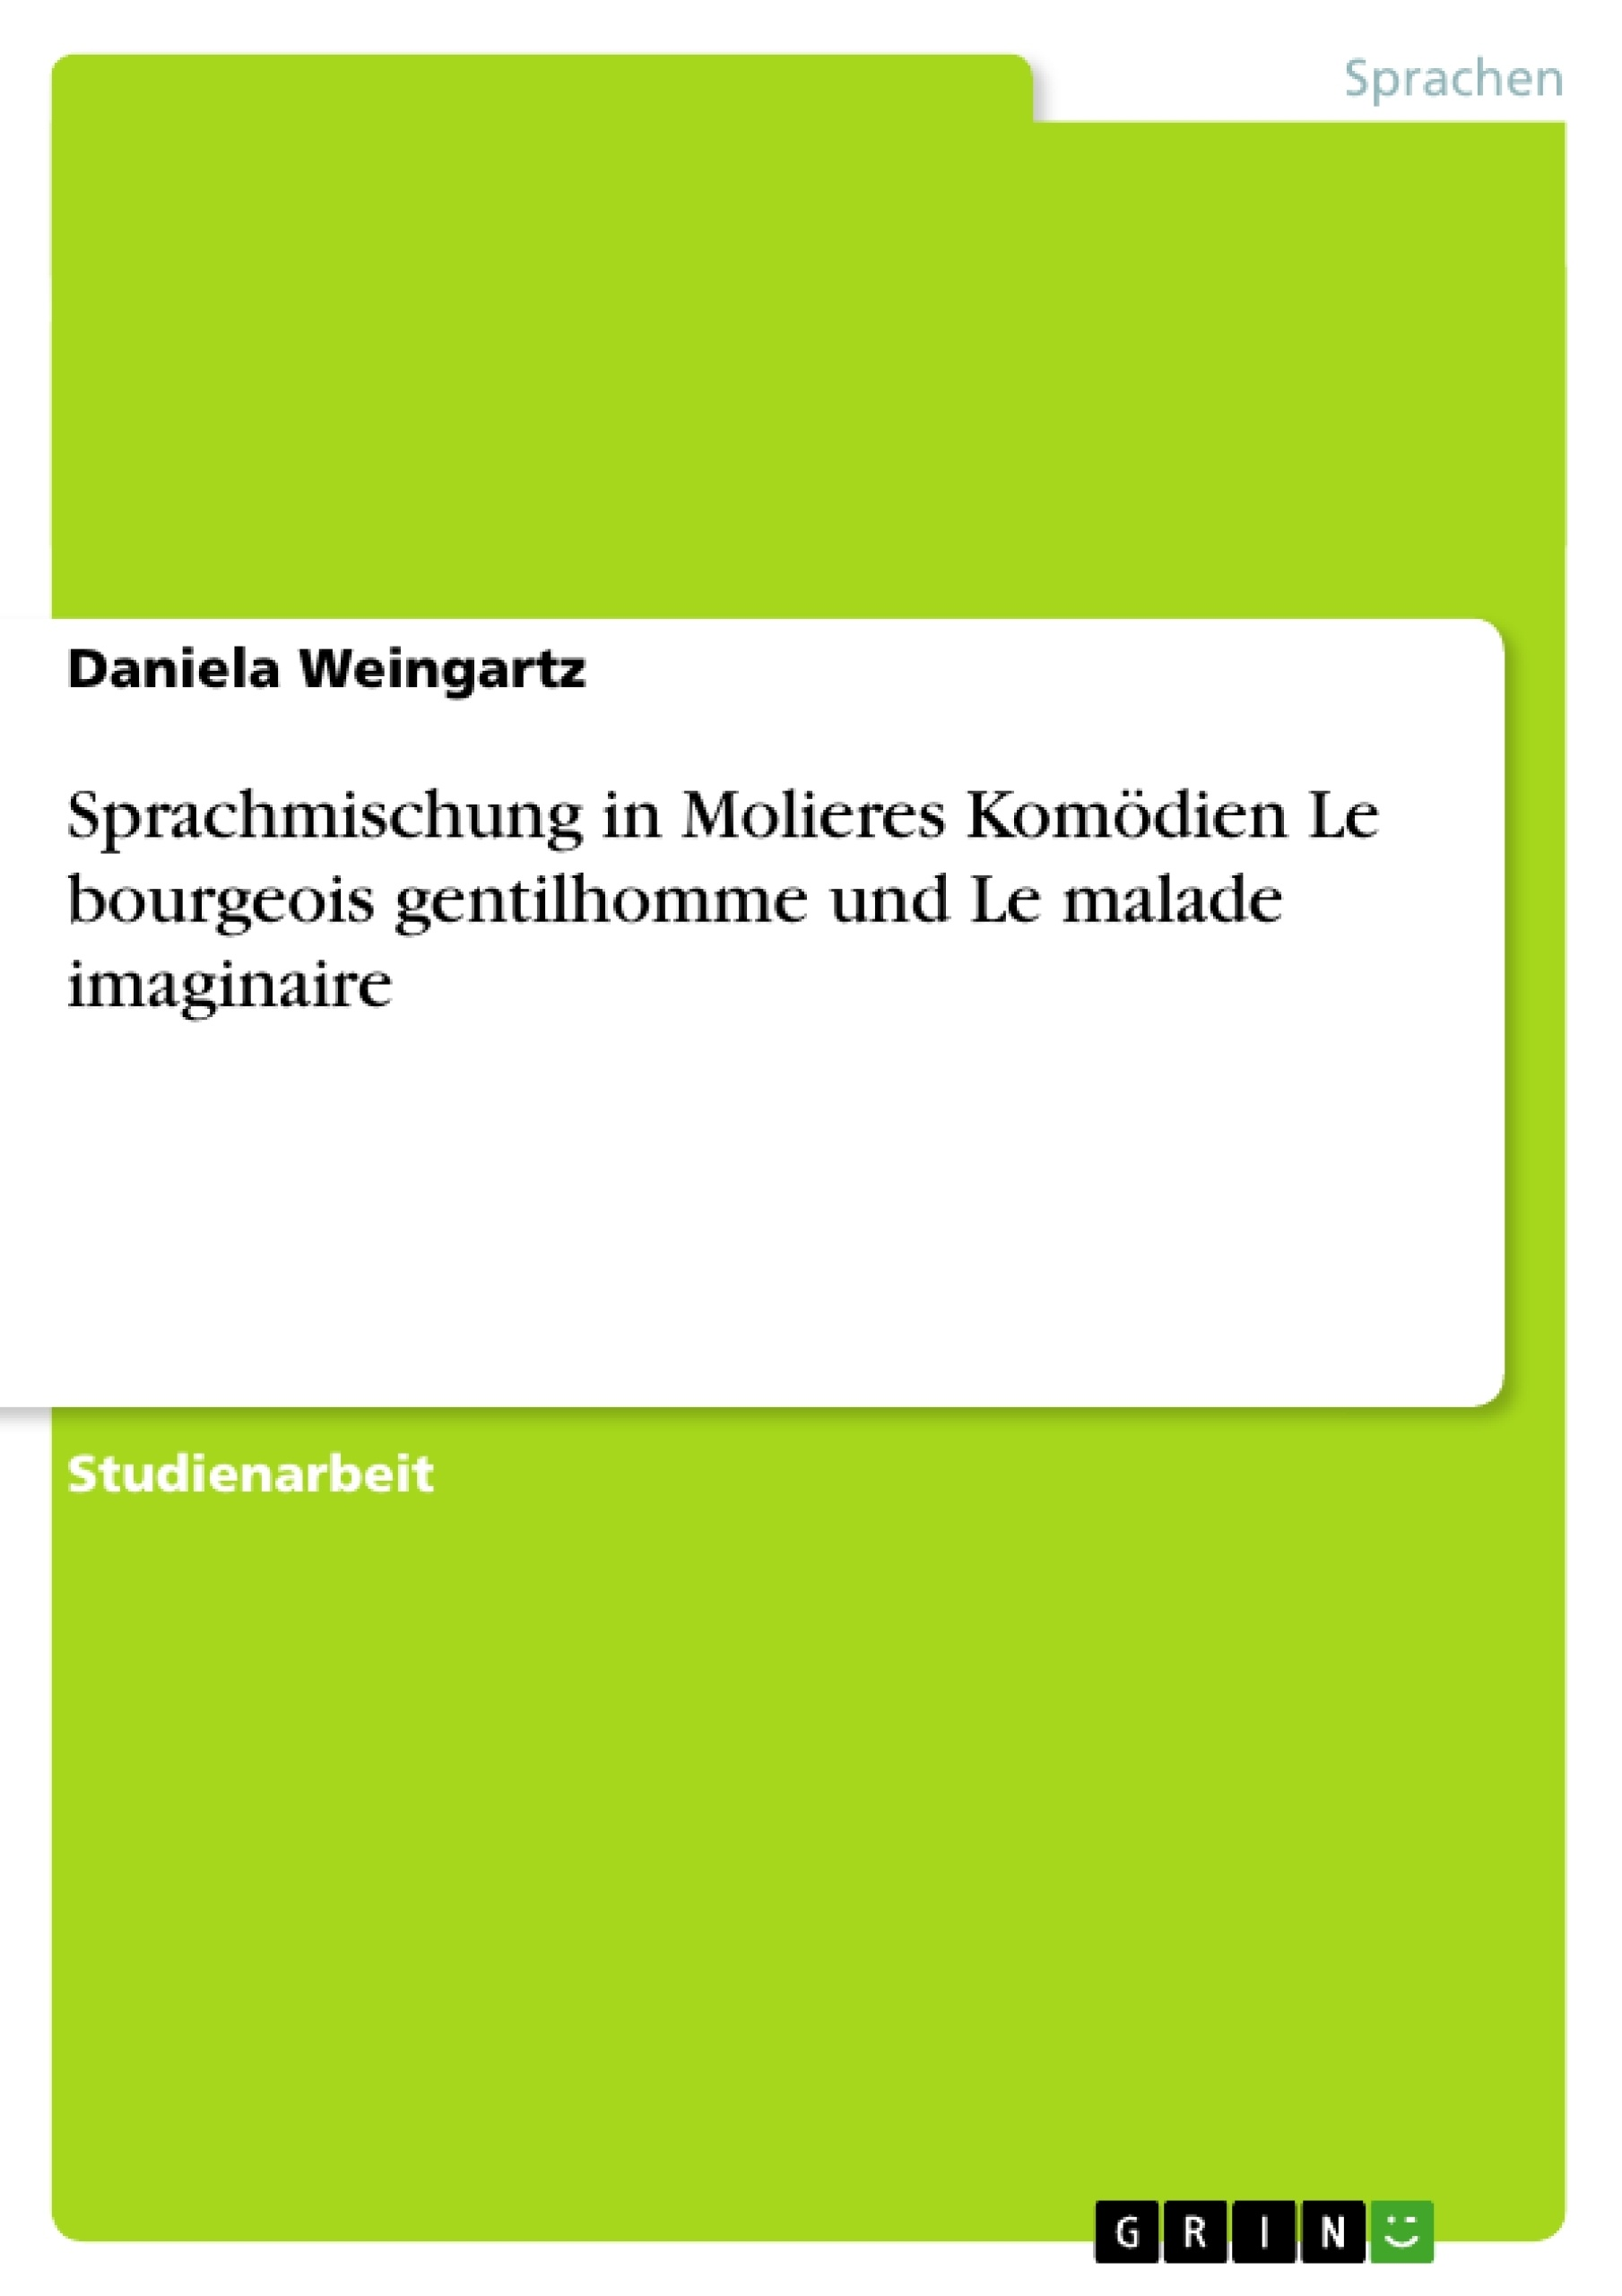 Titel: Sprachmischung in Molieres Komödien Le bourgeois gentilhomme und Le malade imaginaire